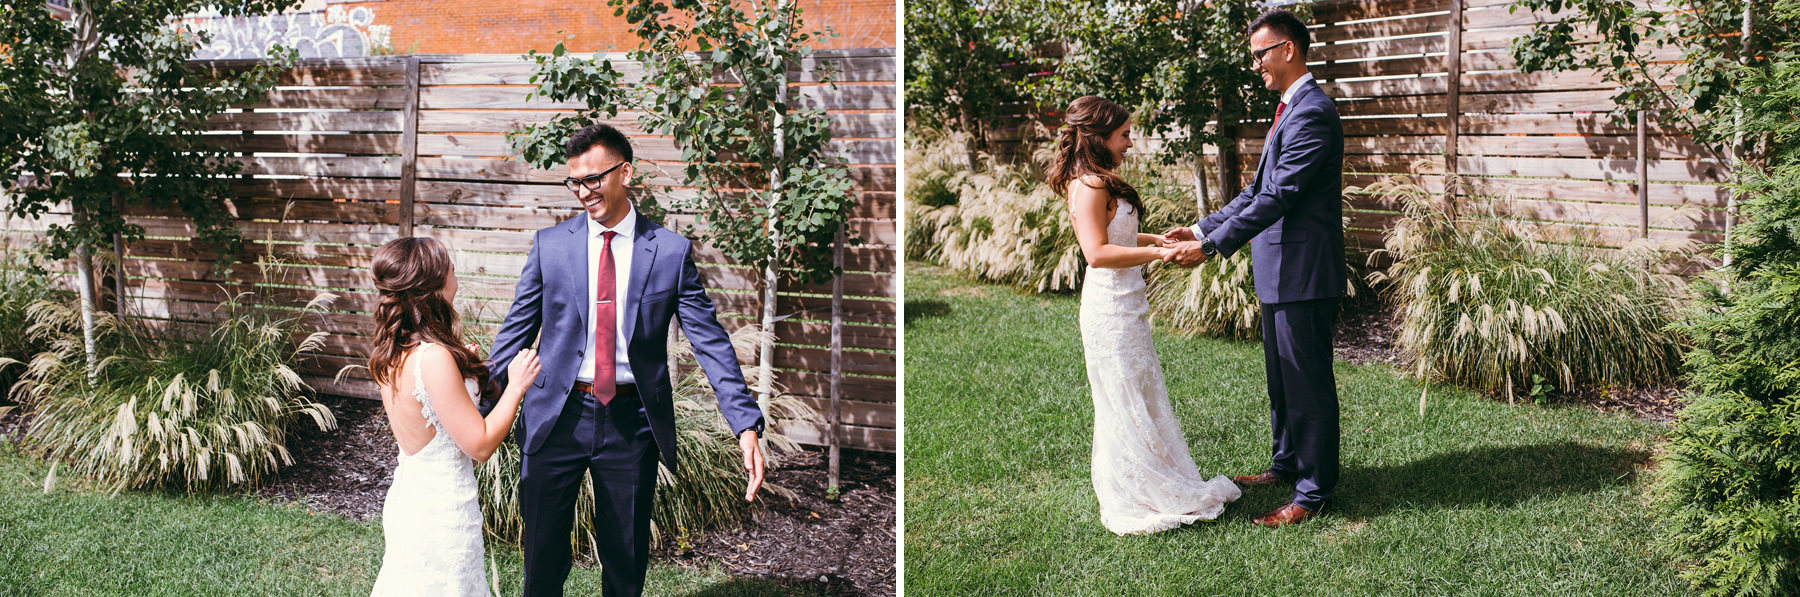 Kansas City Summer Wedding at the Guild_Kindling Wedding Photography Blog31.JPG